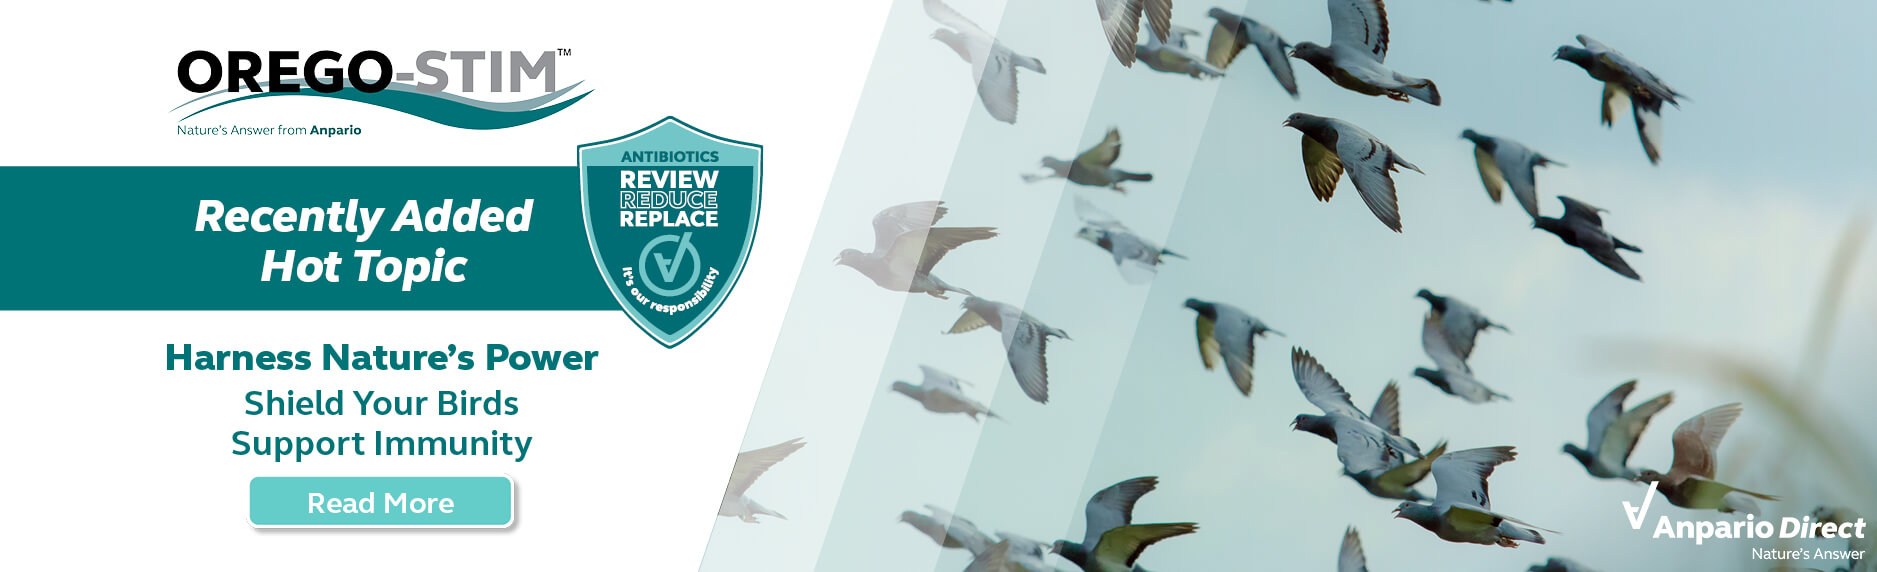 Orego-Stim - Nature's Answer - to Supporting Bird Immunity